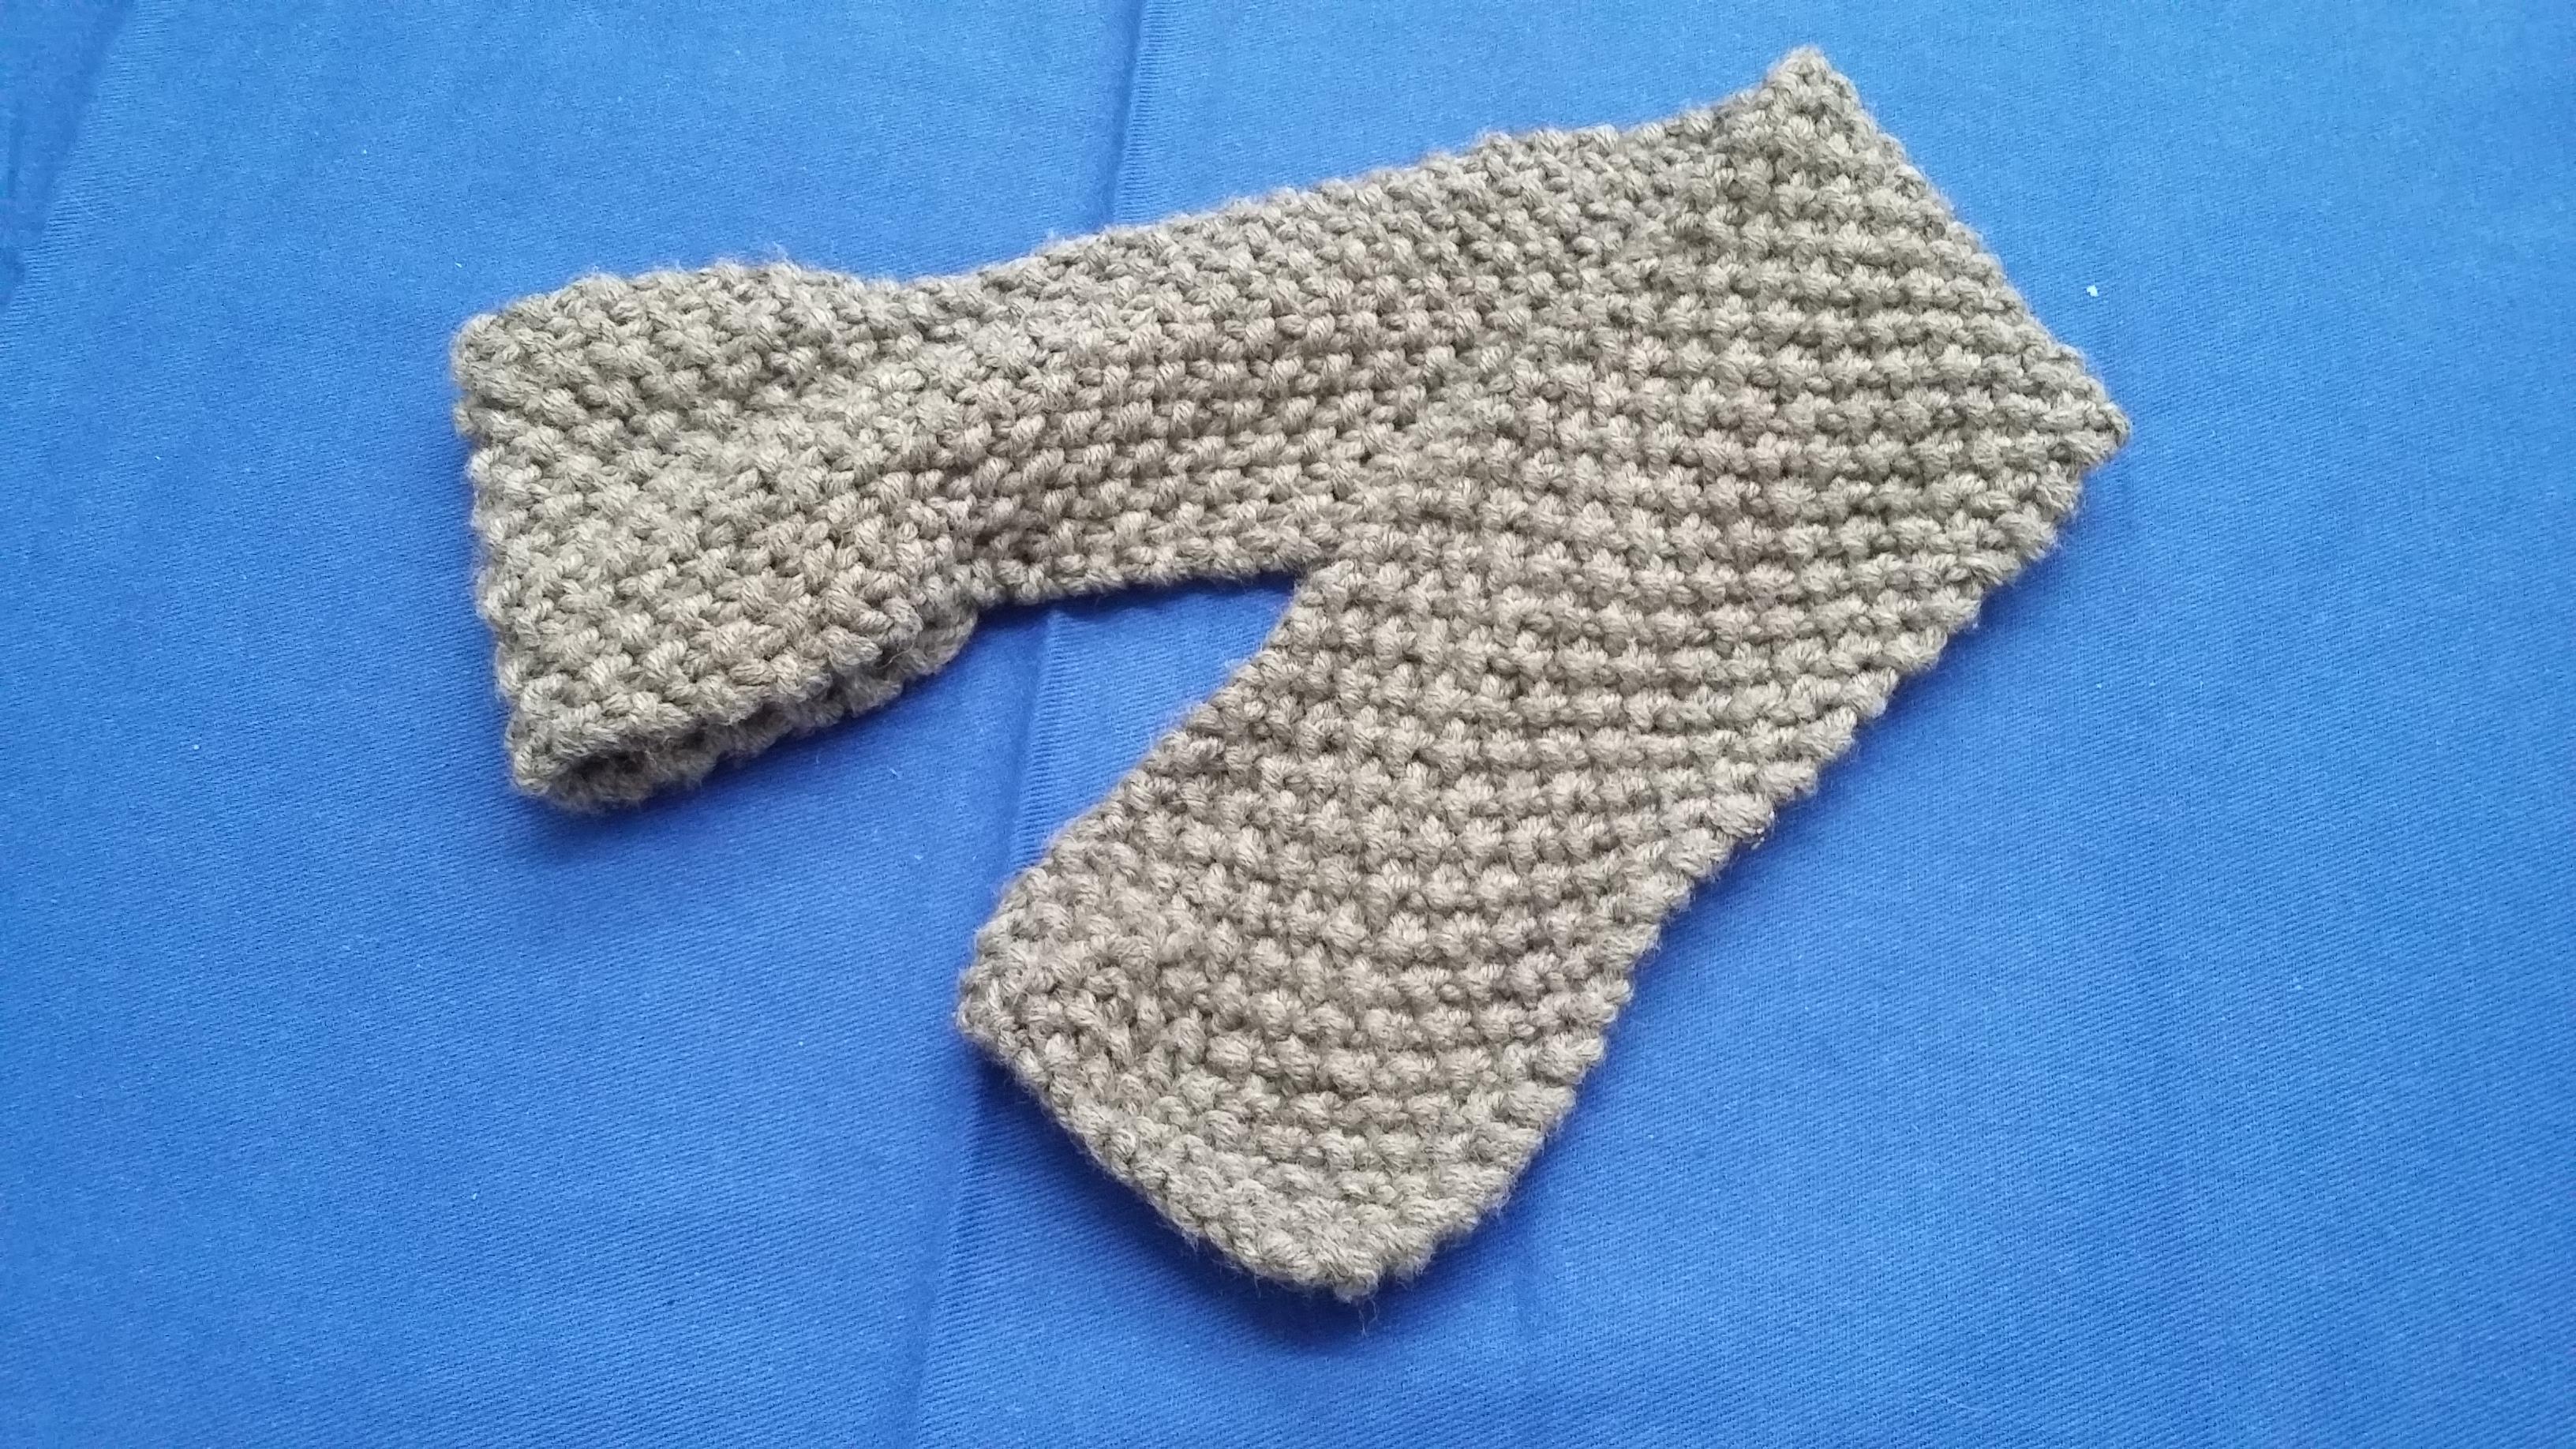 sito affidabile c464a 59e10 Sciarpa bimbo o bimba / Baby scarf - FromAnnA'sHands